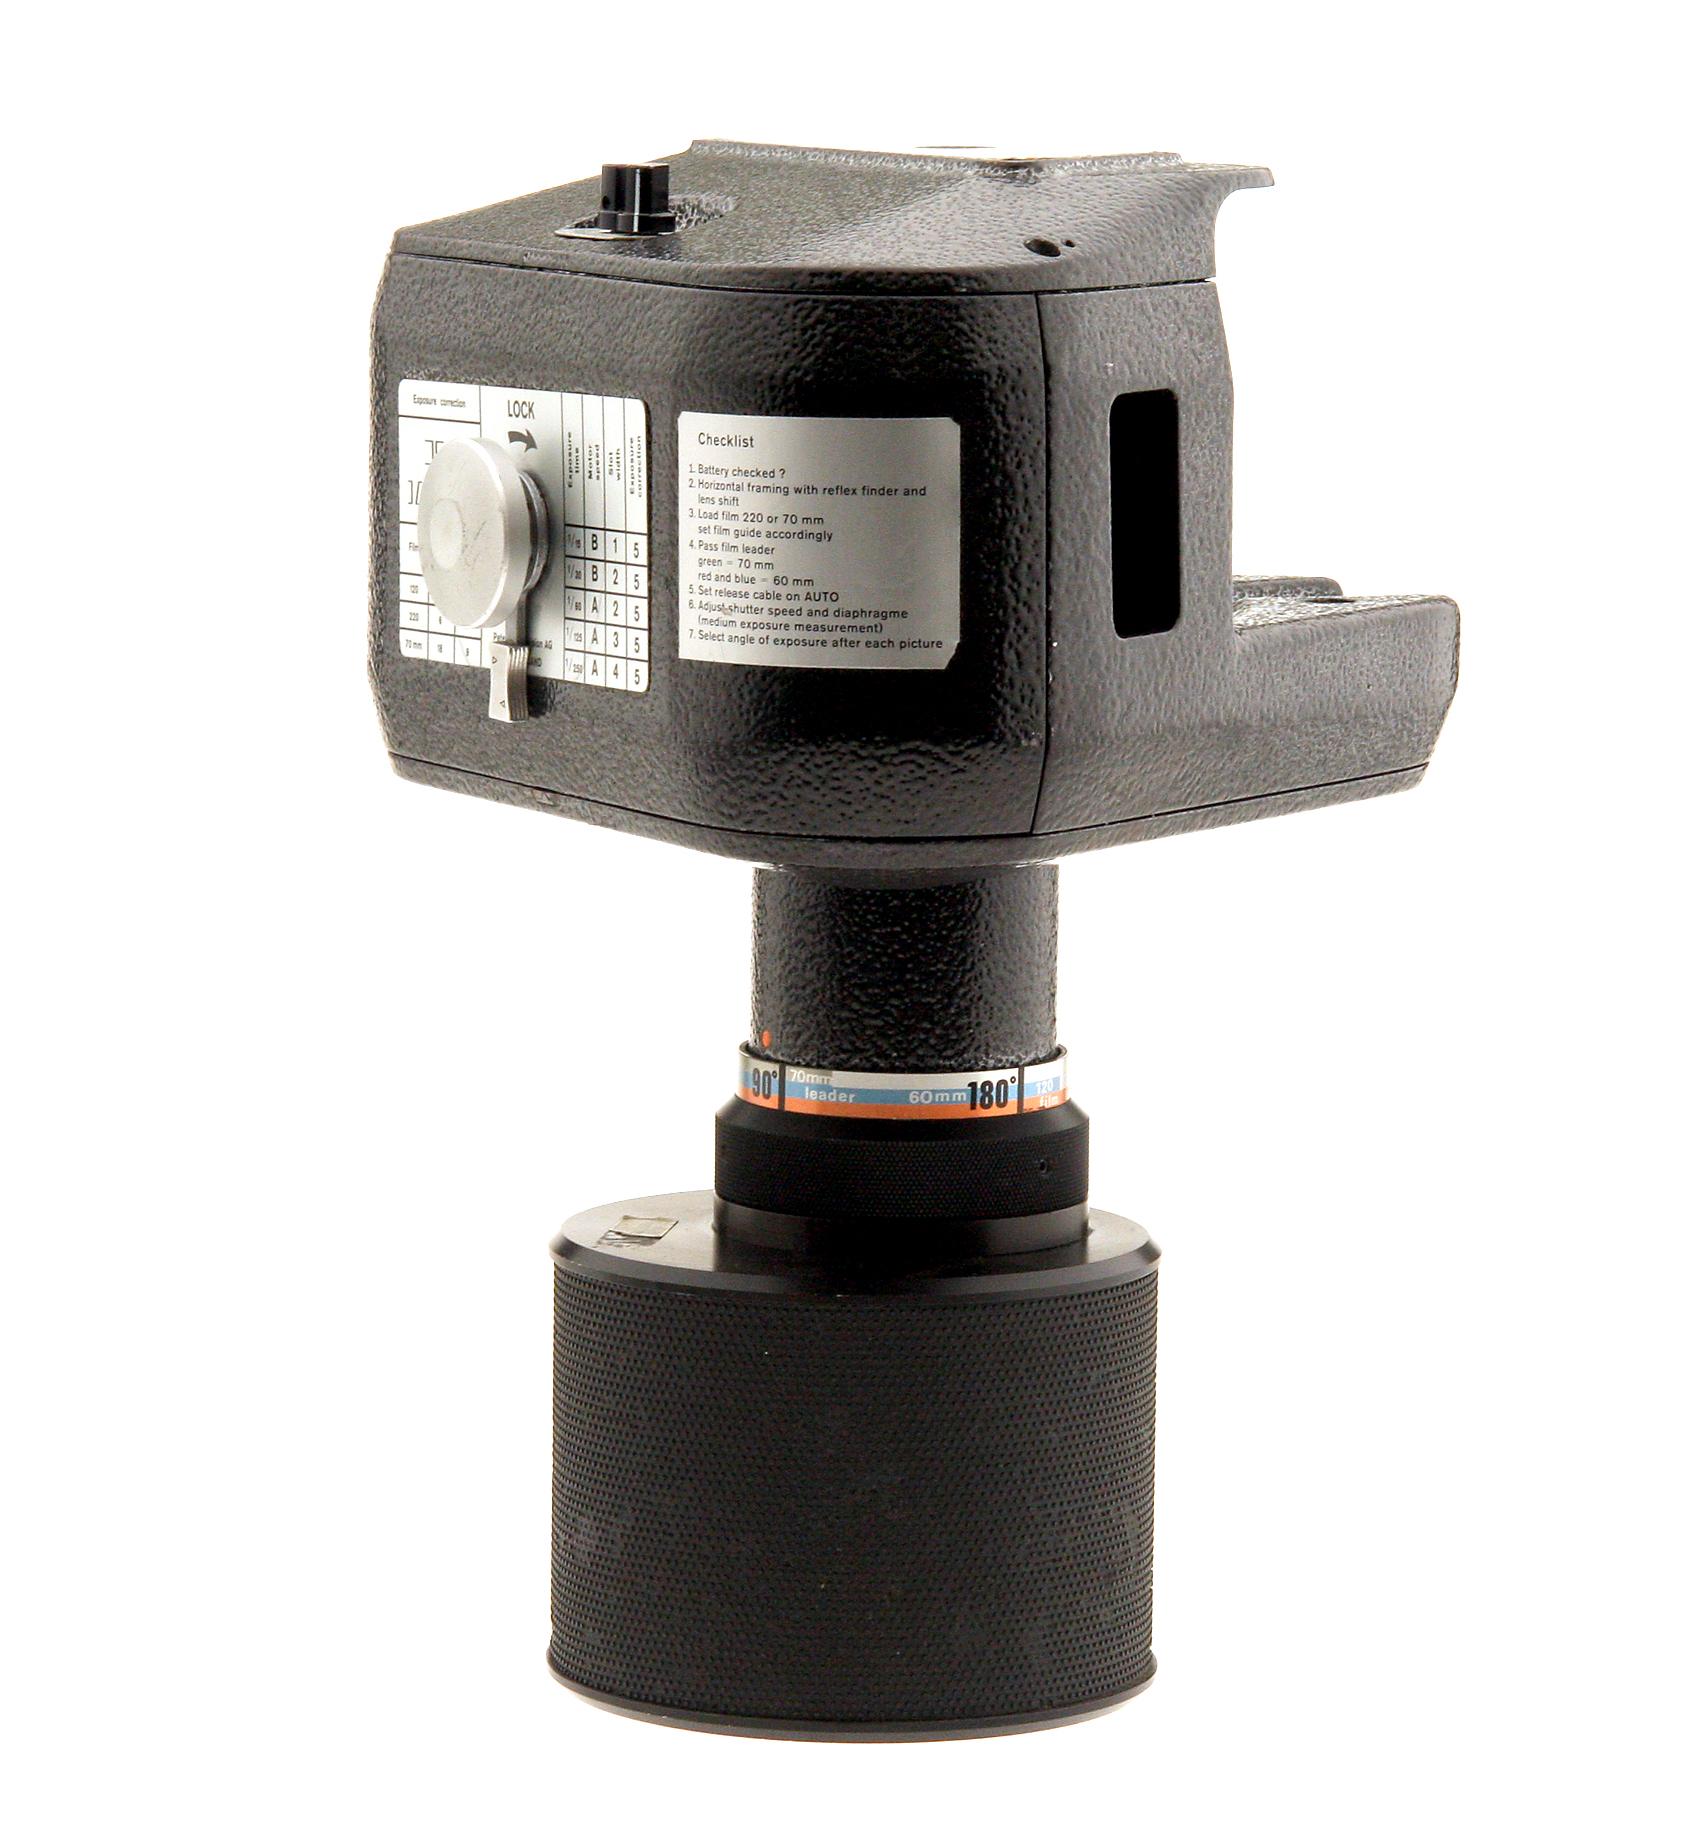 Rotocamera 6070 Panoramic Camera  75mm F6.8 Rodenstock Lens Used